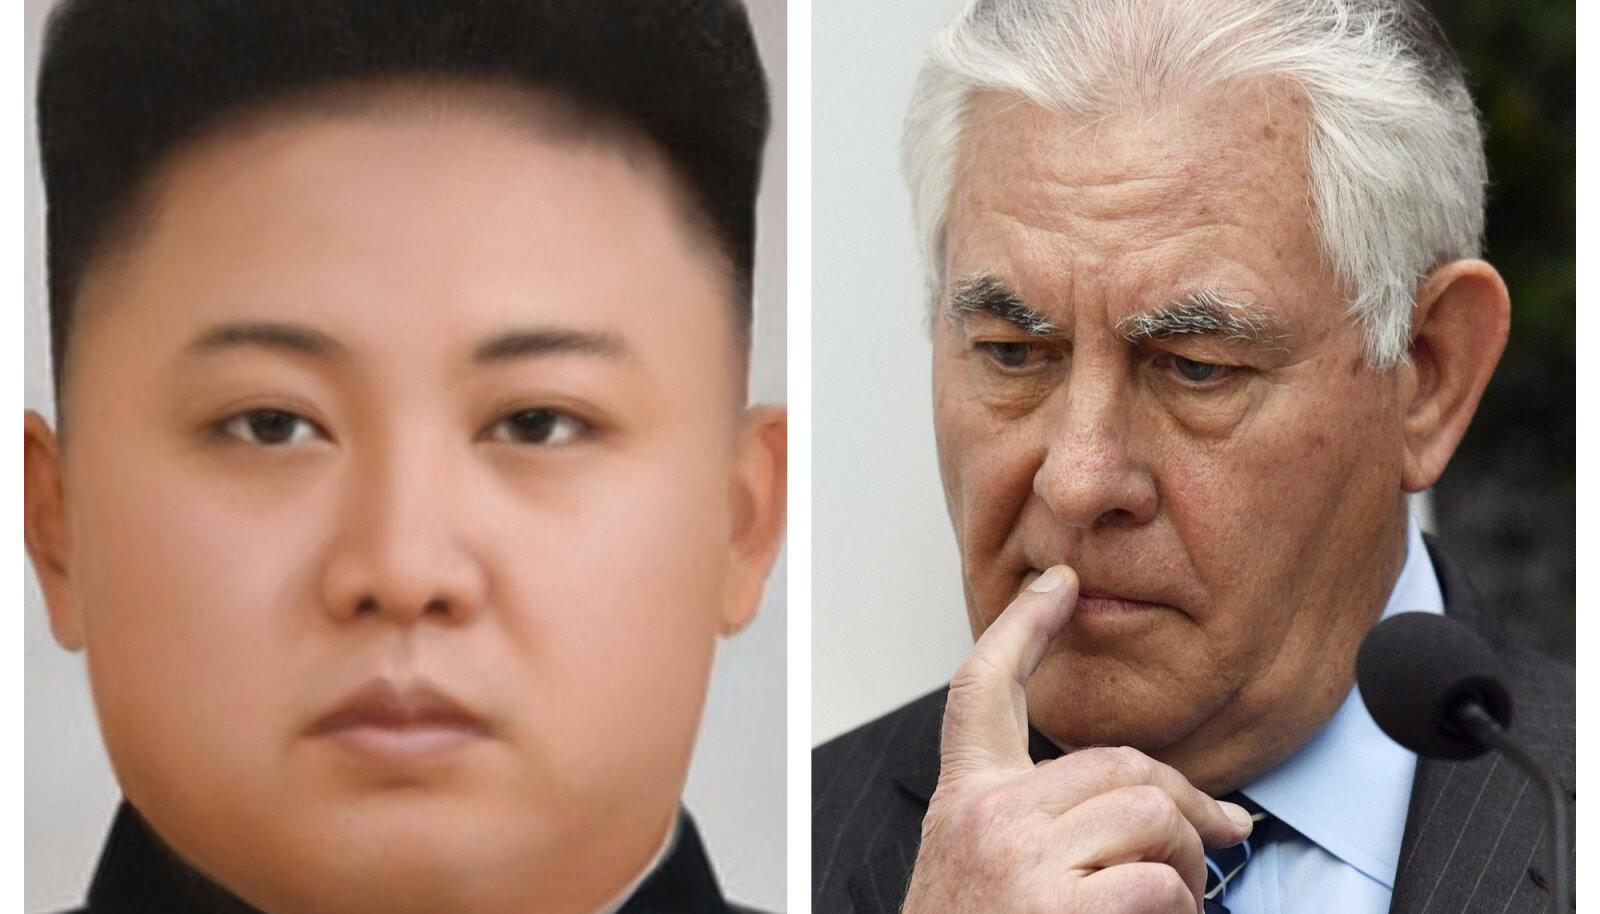 Kollaaž: vasakul Põhja-Korea diktaator Kim Jong-Un (foto: Wikimedia Commons / P388388),  paremal USA riigisekretär Rex Tillerson (foto: AFP)